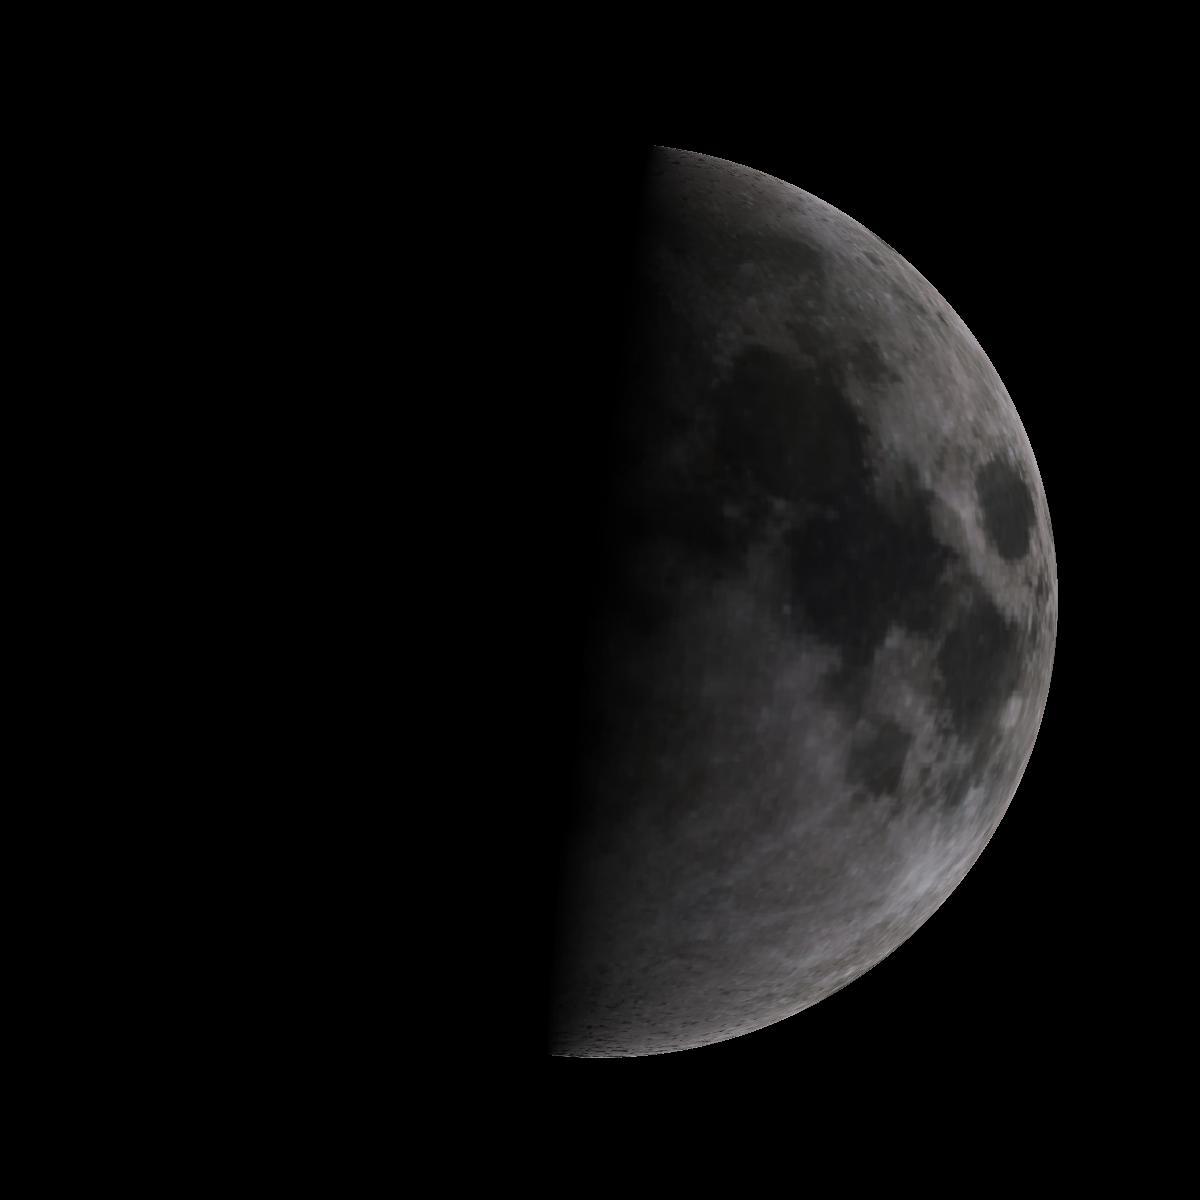 Lune du 3 mars 2020